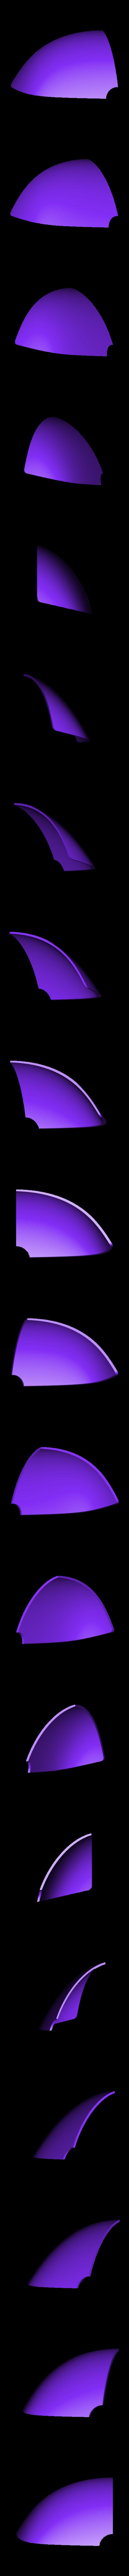 TMBackPanelB.stl Download free STL file TELEAVIA MATRIX • 3D printable design, Qelorliss